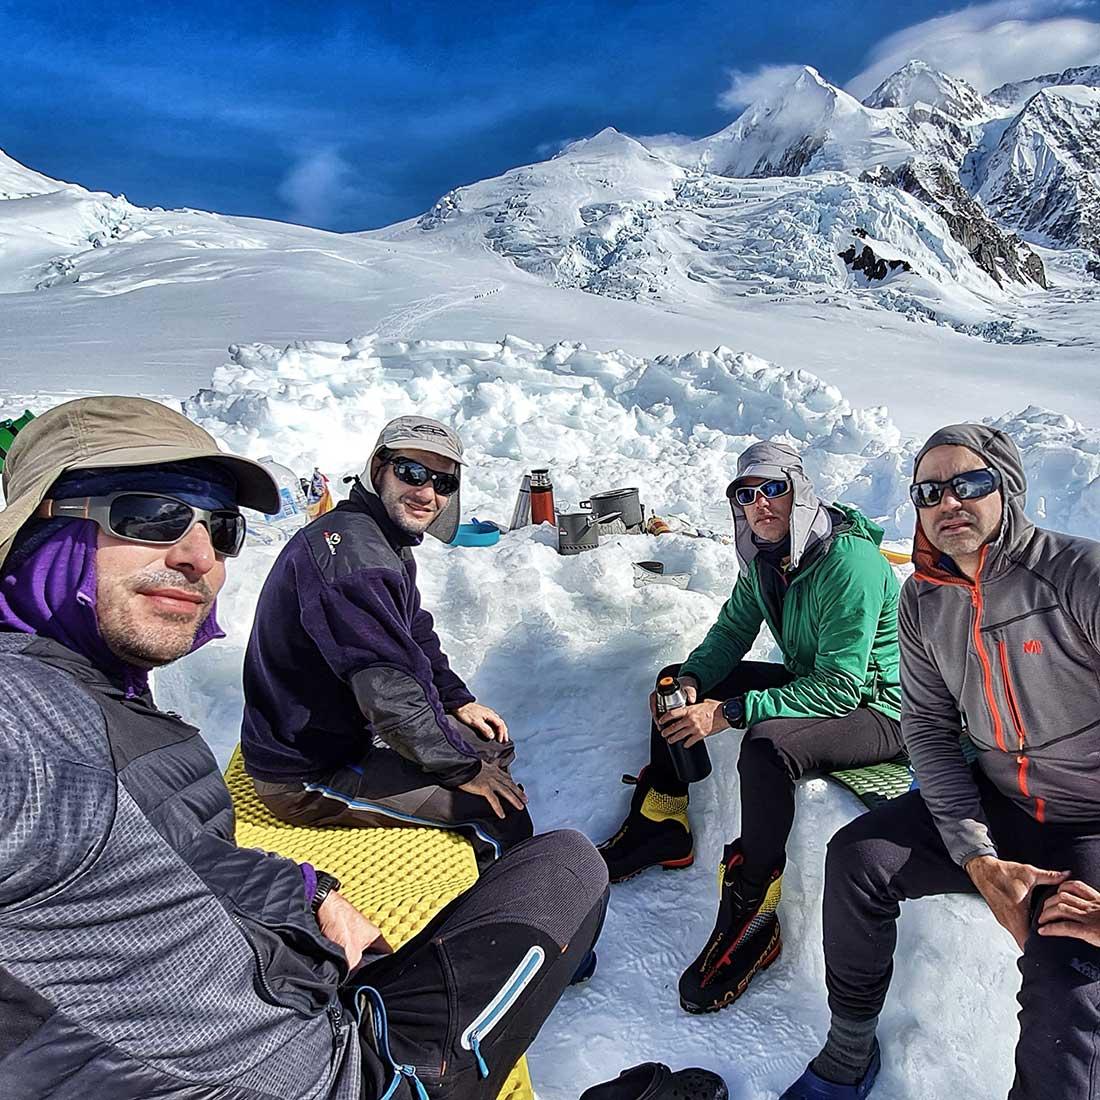 Momento de relax antes de intentar la cima. Montañismo a pleno.